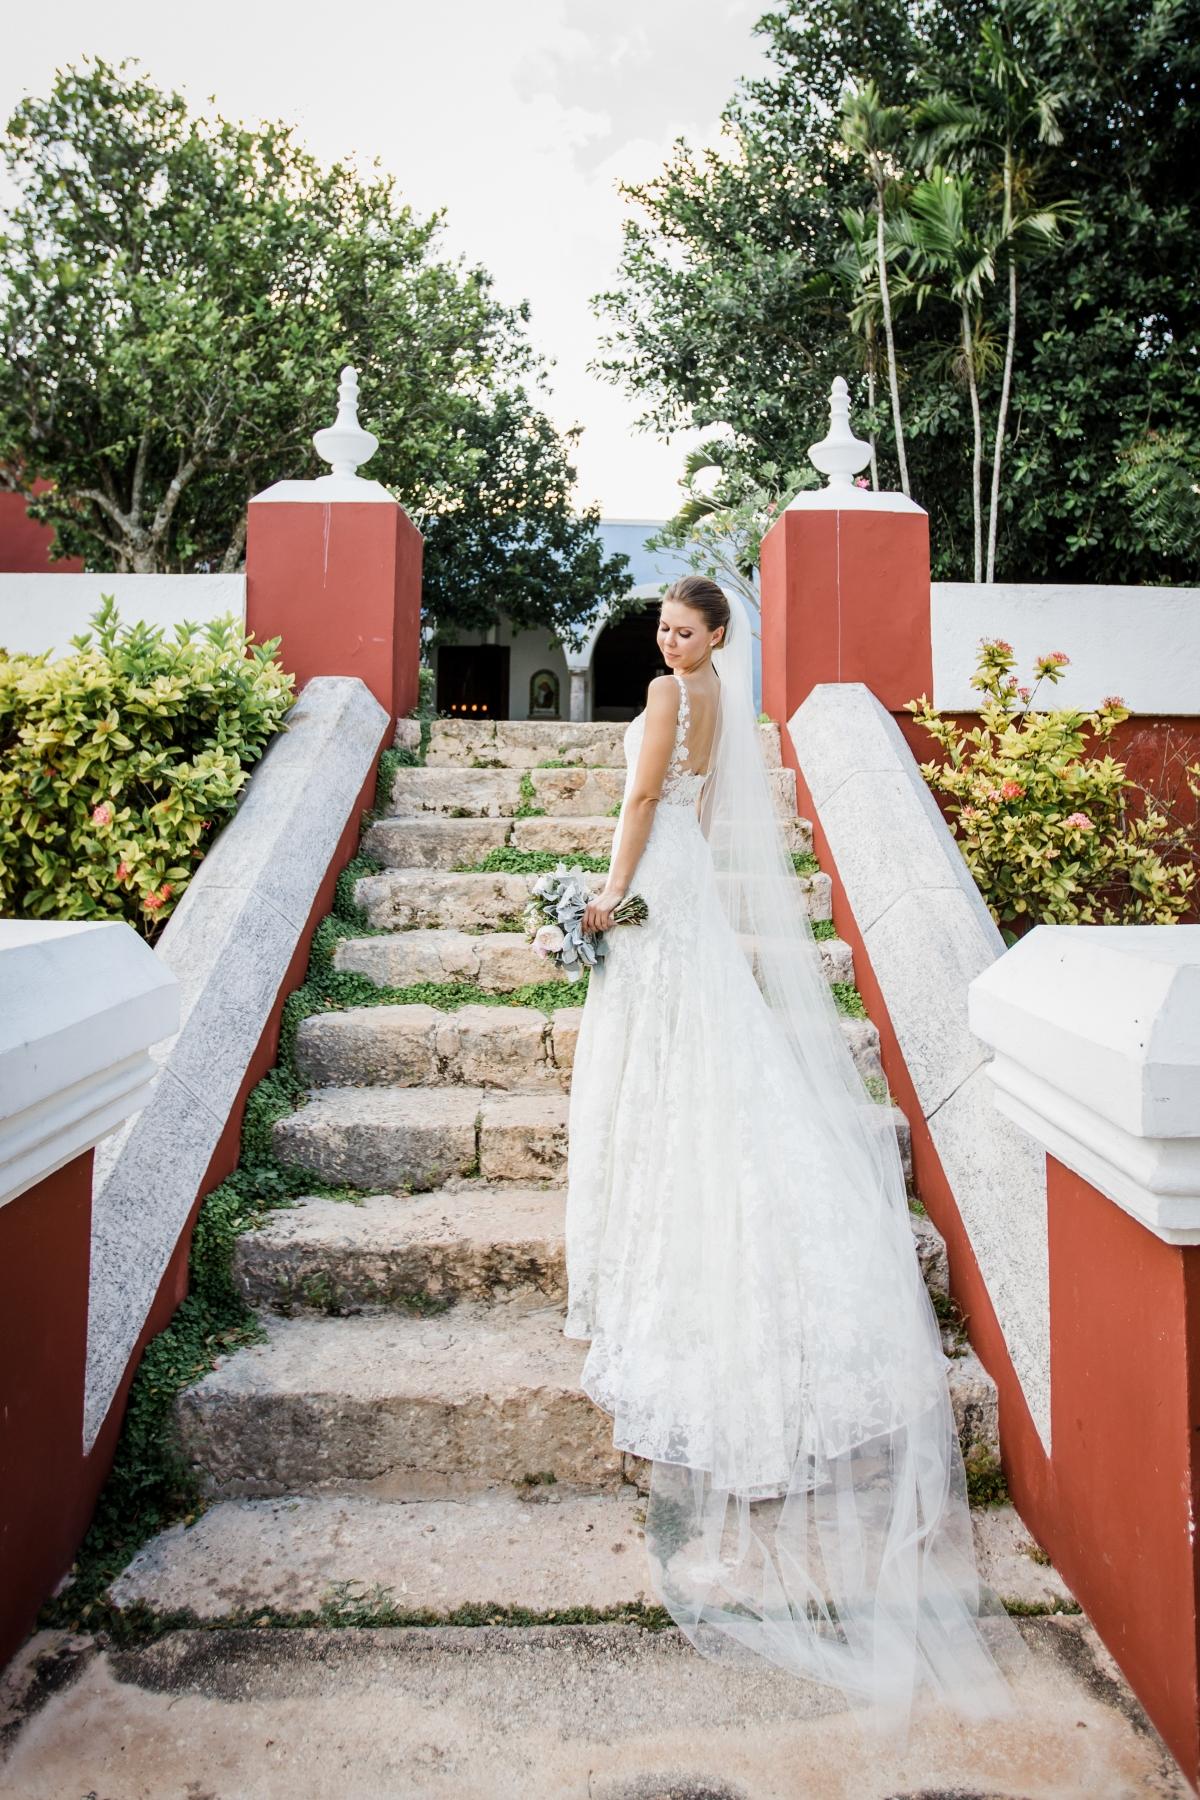 898_elizabeth medina photography 0255 Chable Wedding Photography: Confessions of a Yucatan Bride, Yucatan Destination Wedding Photography from A Merida Bride's Planning Diary